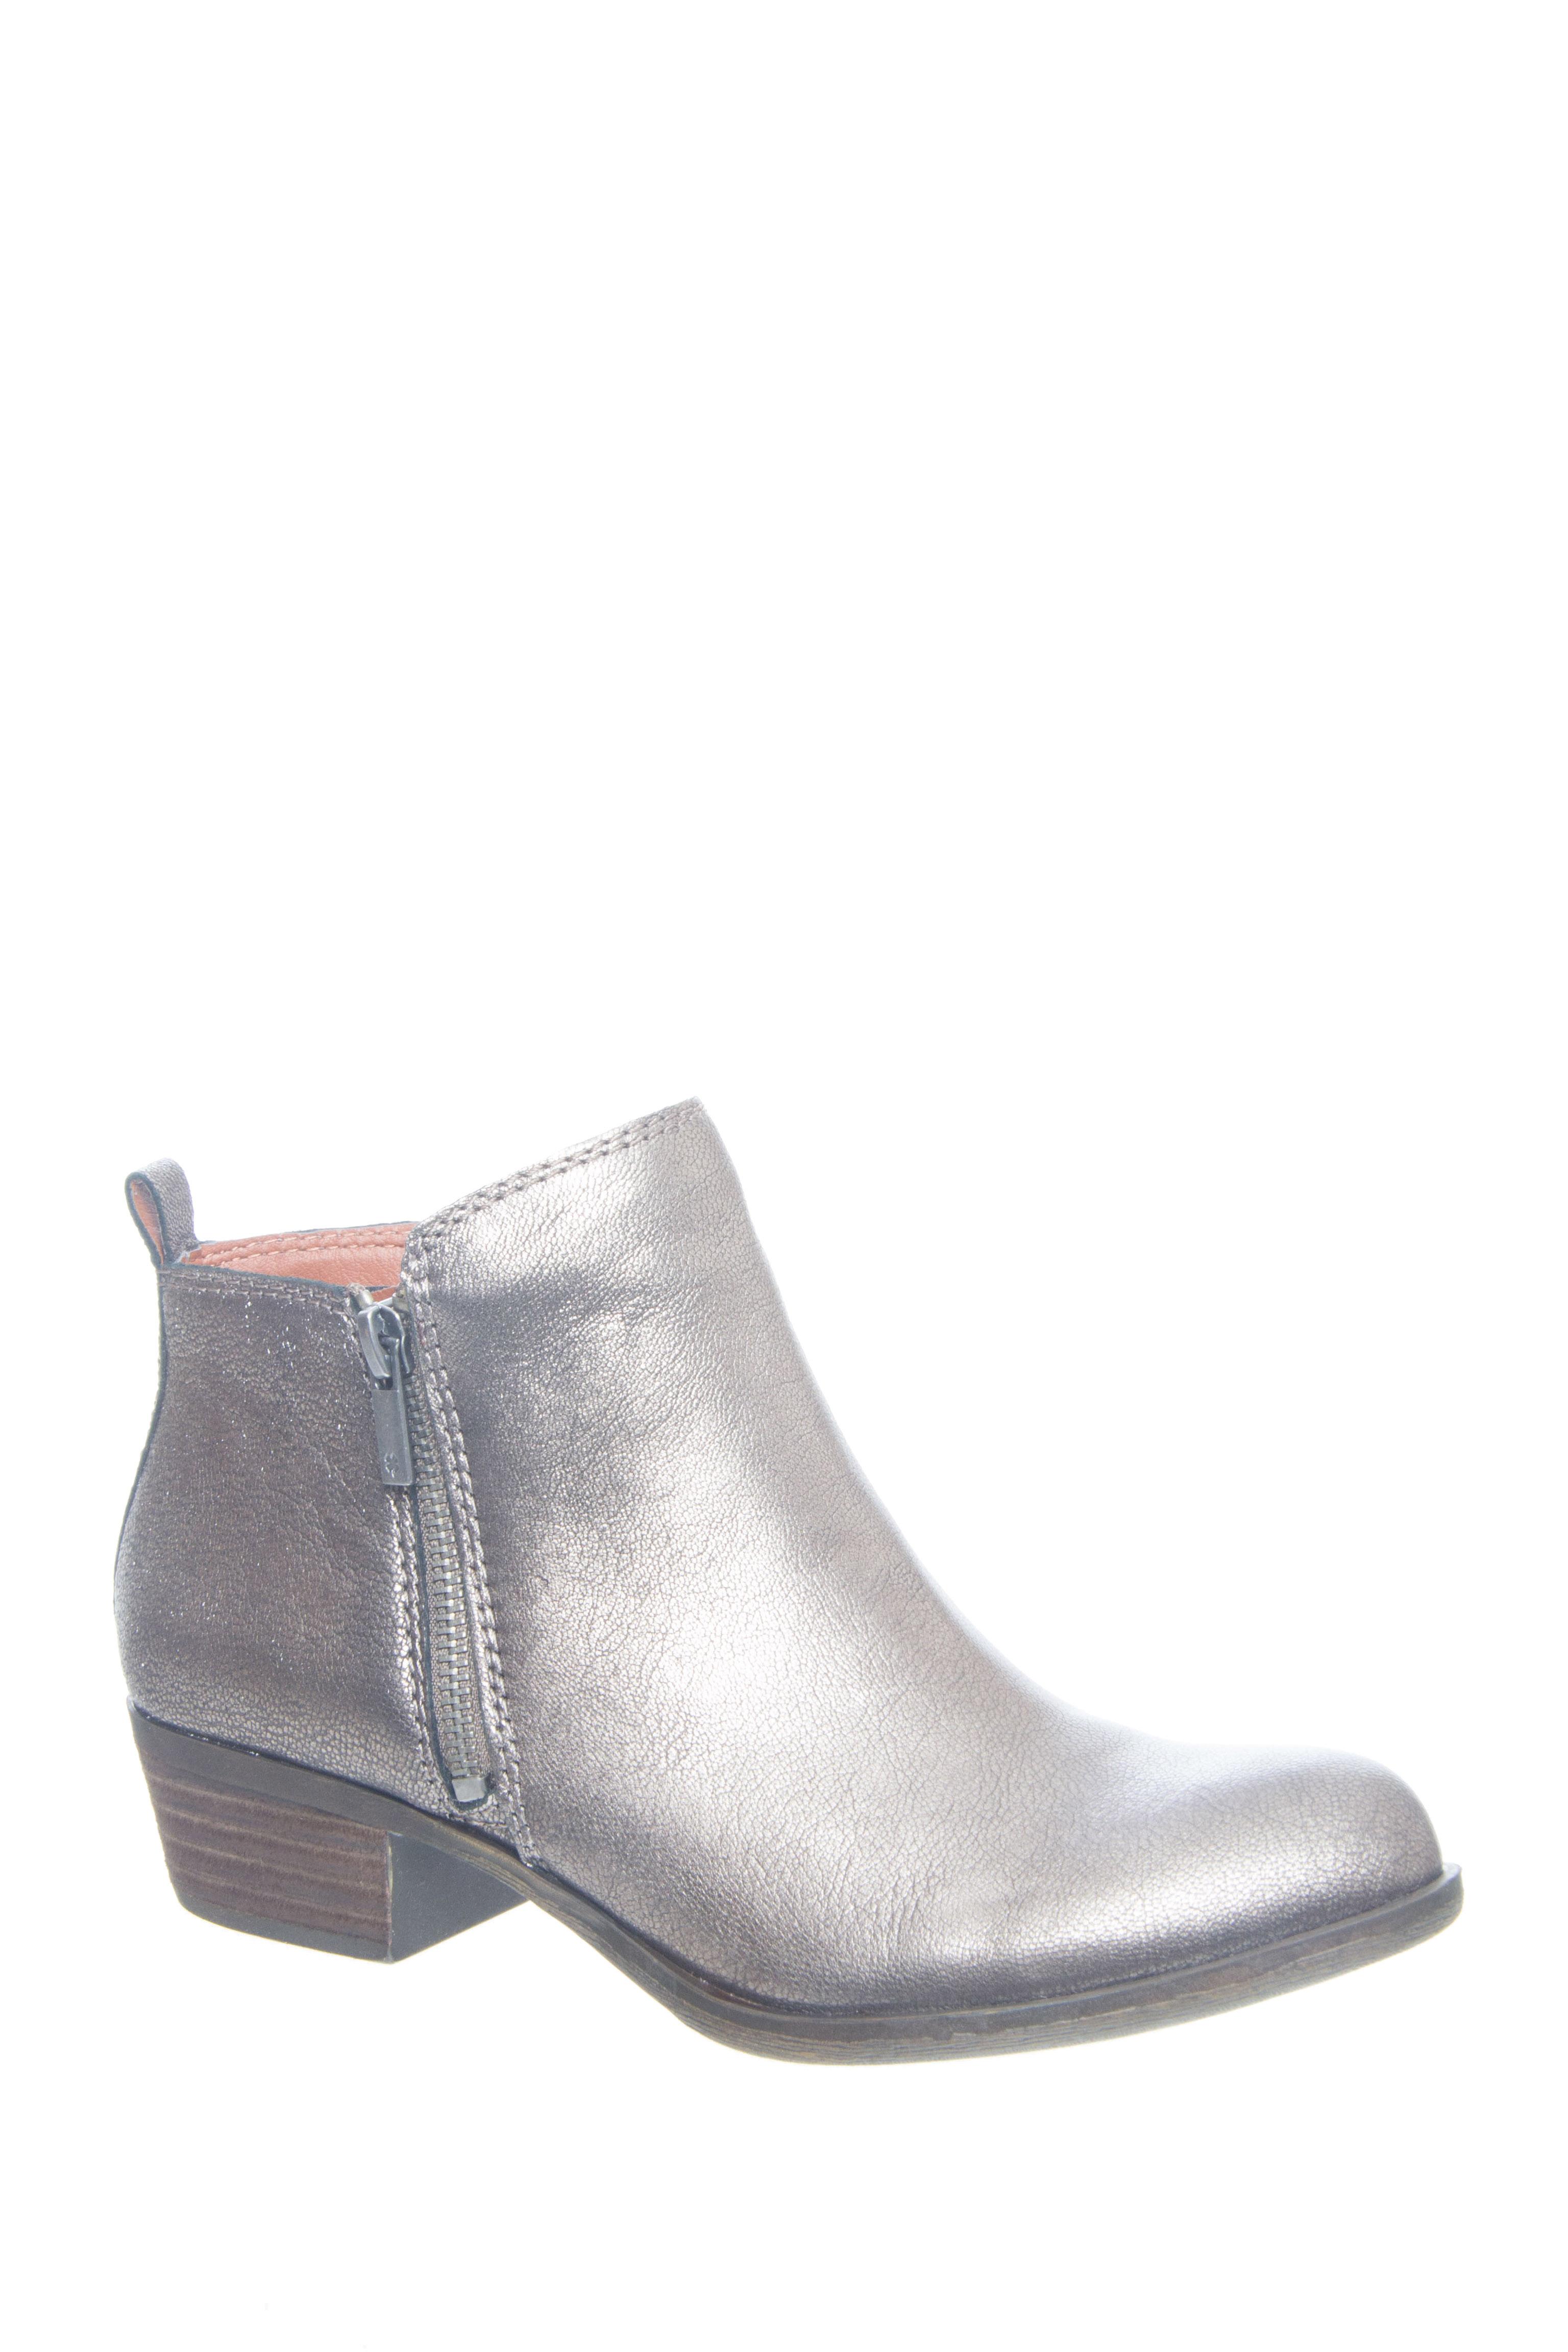 Vintage Style Boots Basel Metallic Low Heel Bootie - Old Pewter $128.99 AT vintagedancer.com